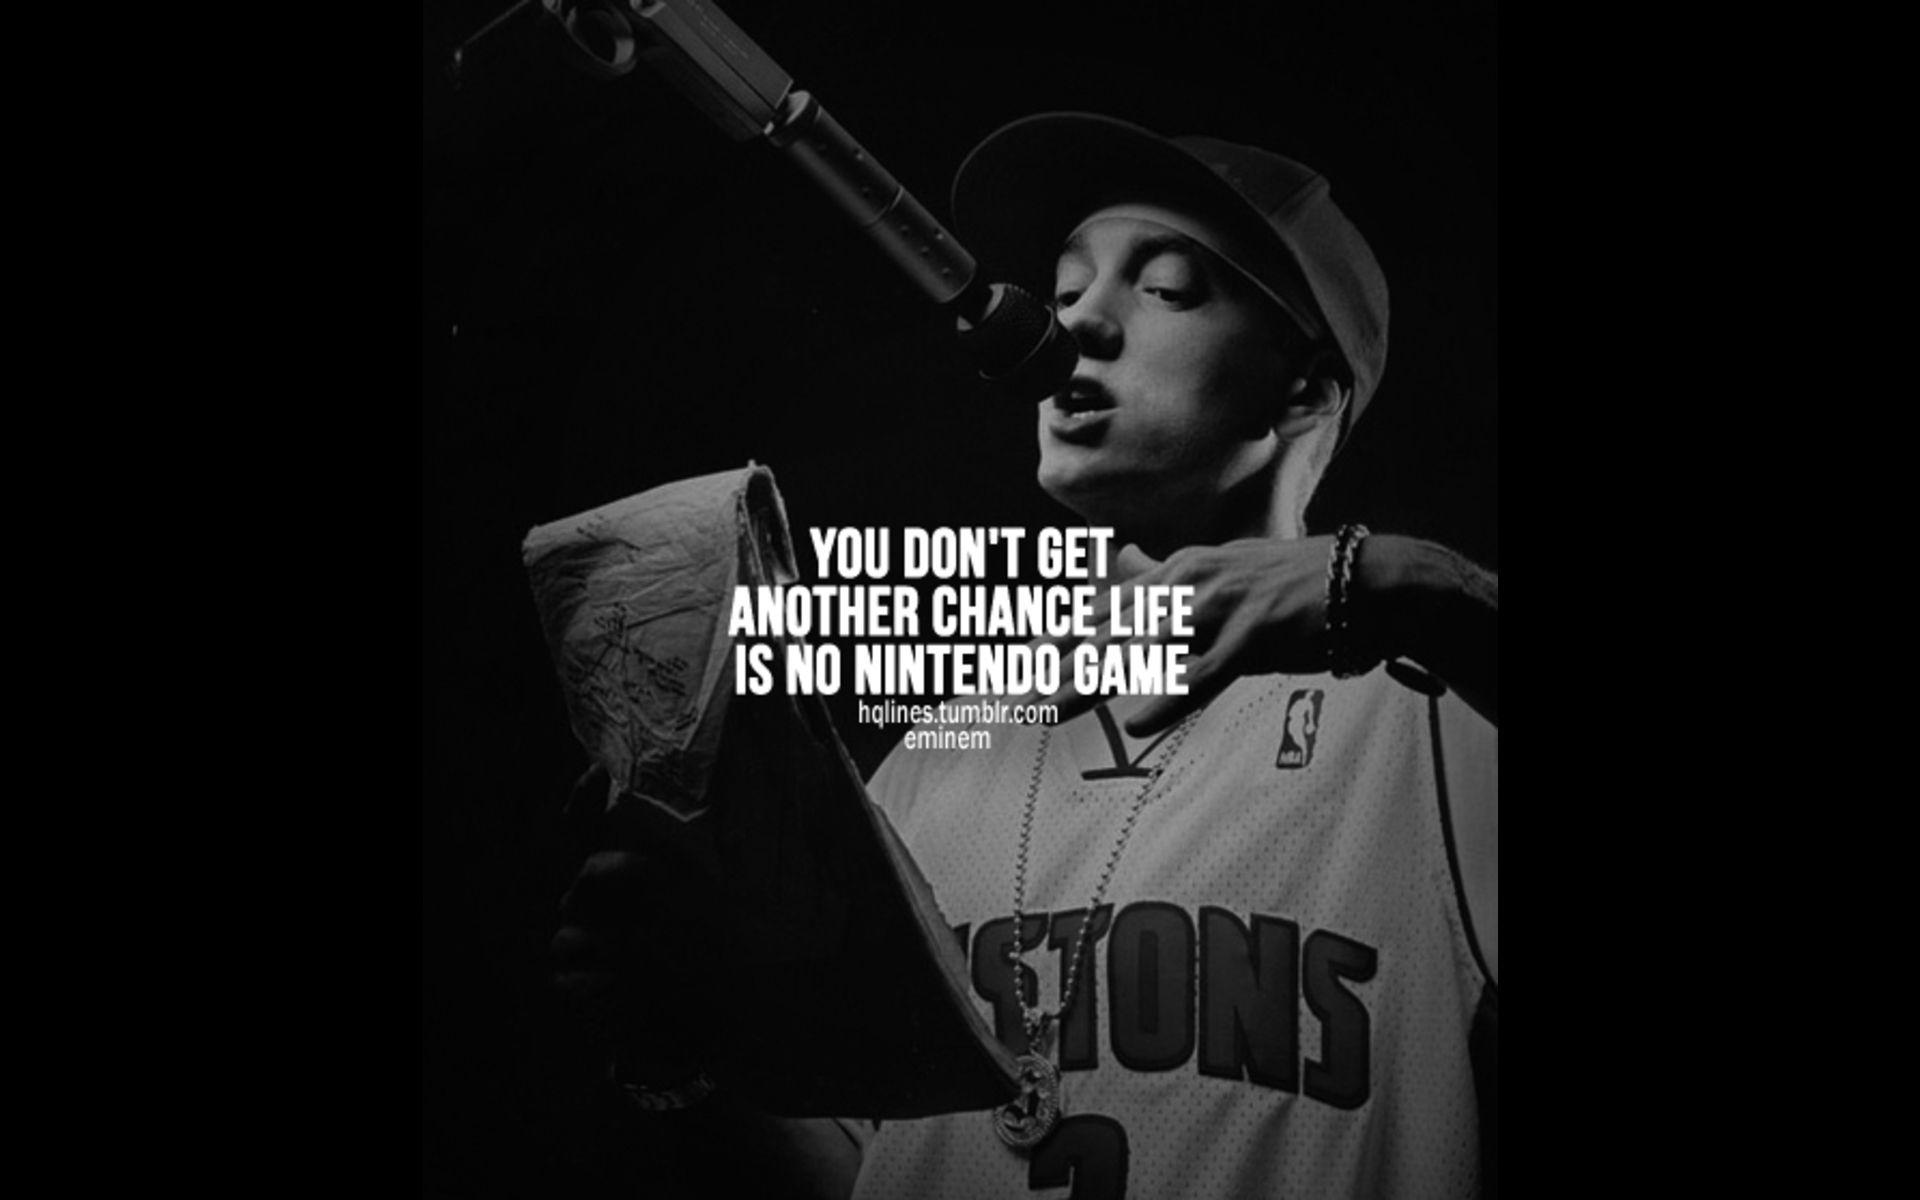 Eminem Hd Wallpapers Wallpaper 1920 1080 Eminem Wallpaper Hd 62 Wallpapers Adorable Wallpapers Eminem Quotes Eminem Wallpapers Eminem